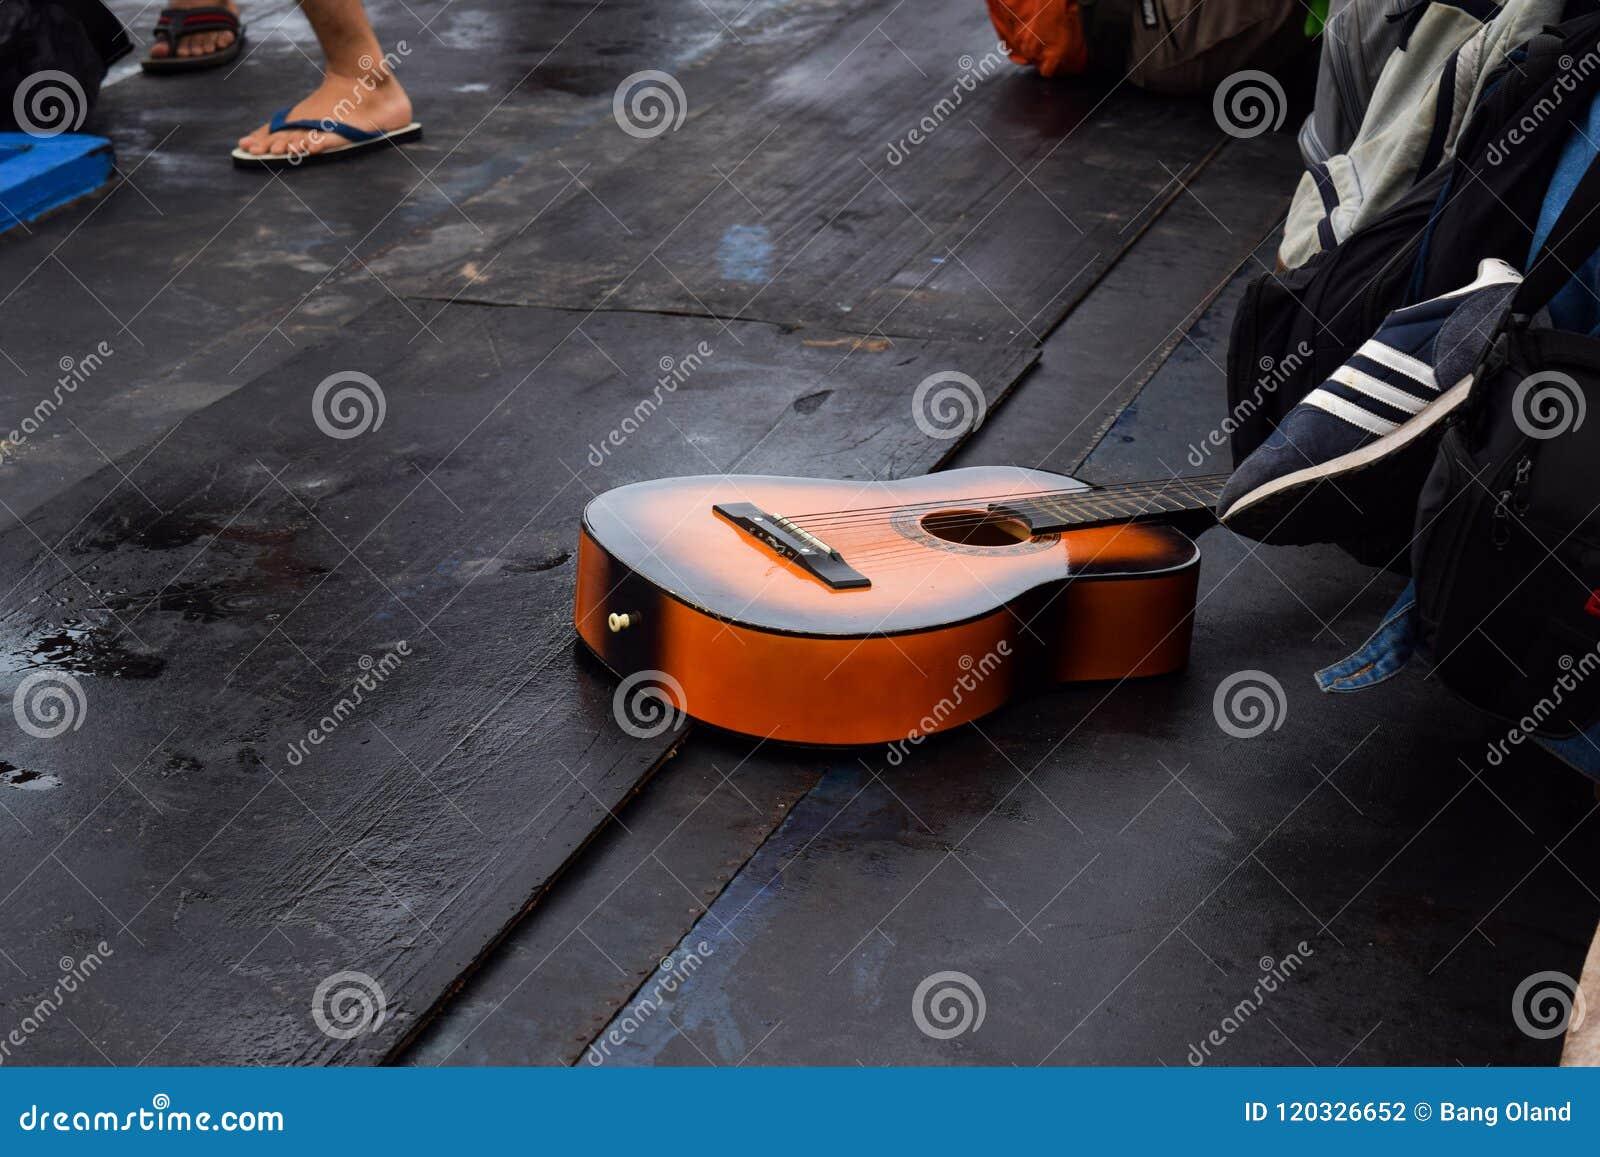 RAJABASA, BANDAR LAMPUNG, INDONESIË 03 JULI, 2018: Was de gitaar bruine kleur in de boot in Sebesi-eiland, Indonesië